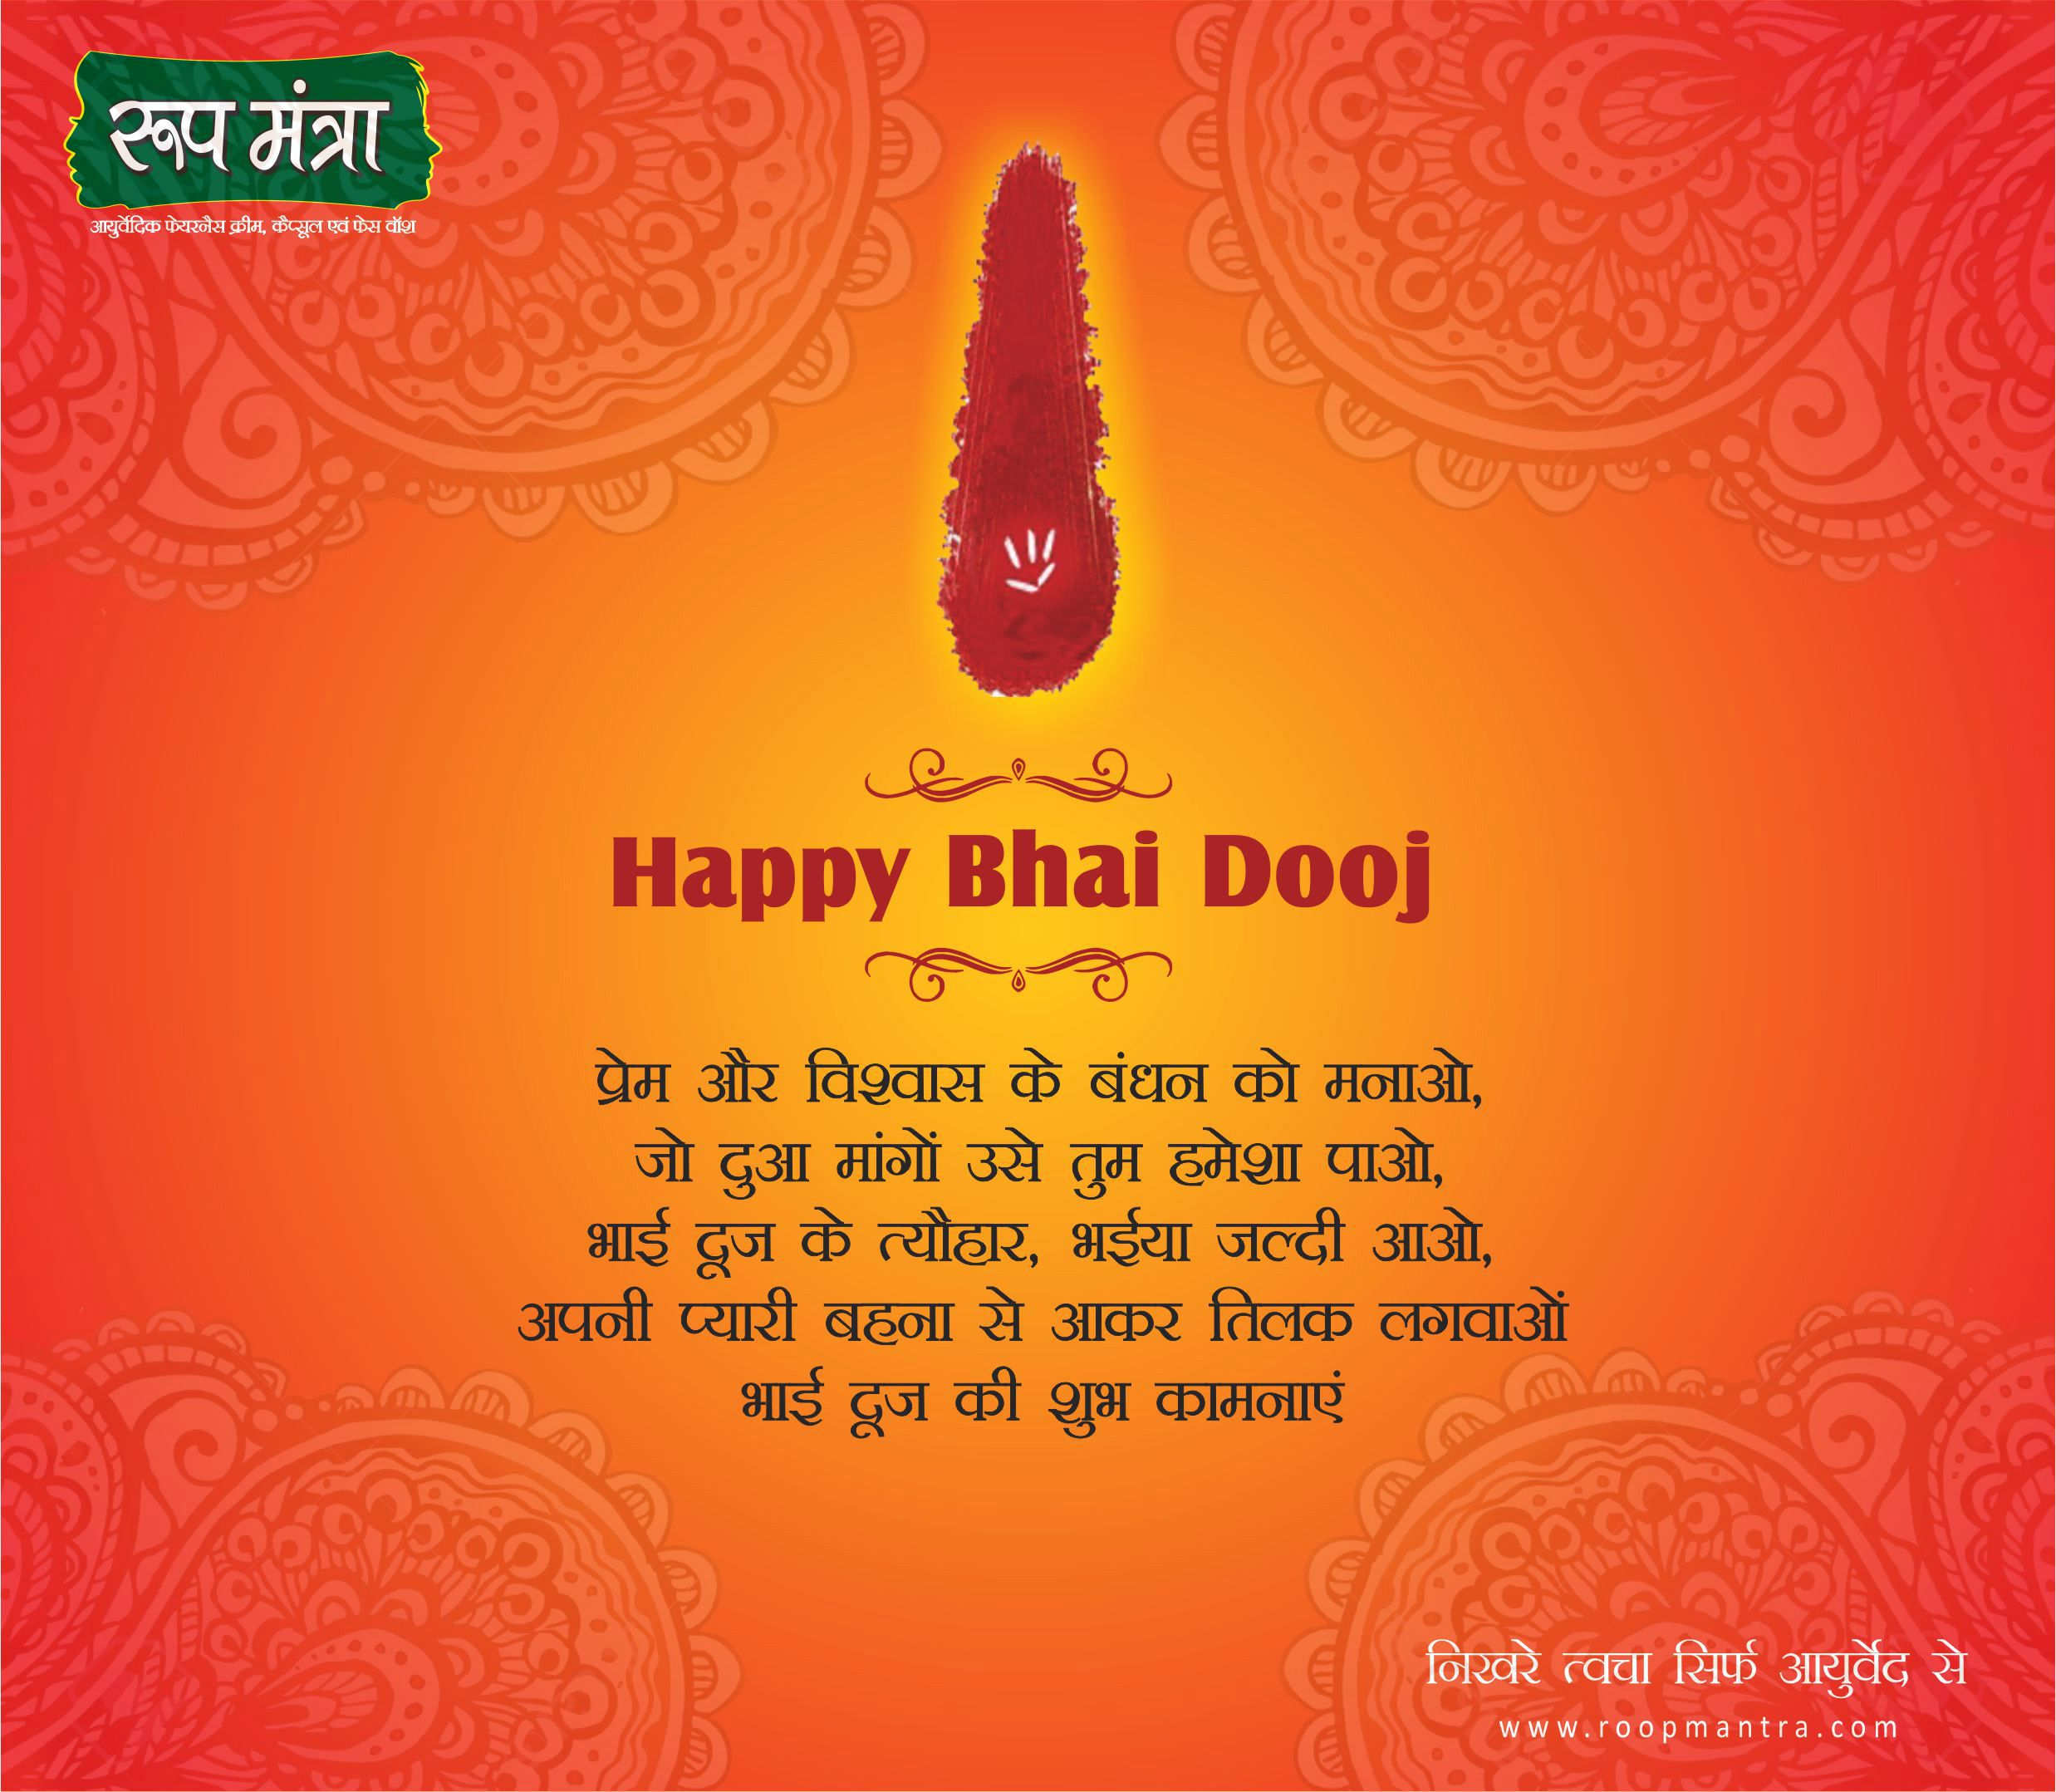 Roop Mantra Wishes you a Very Happy Bhai Dooj